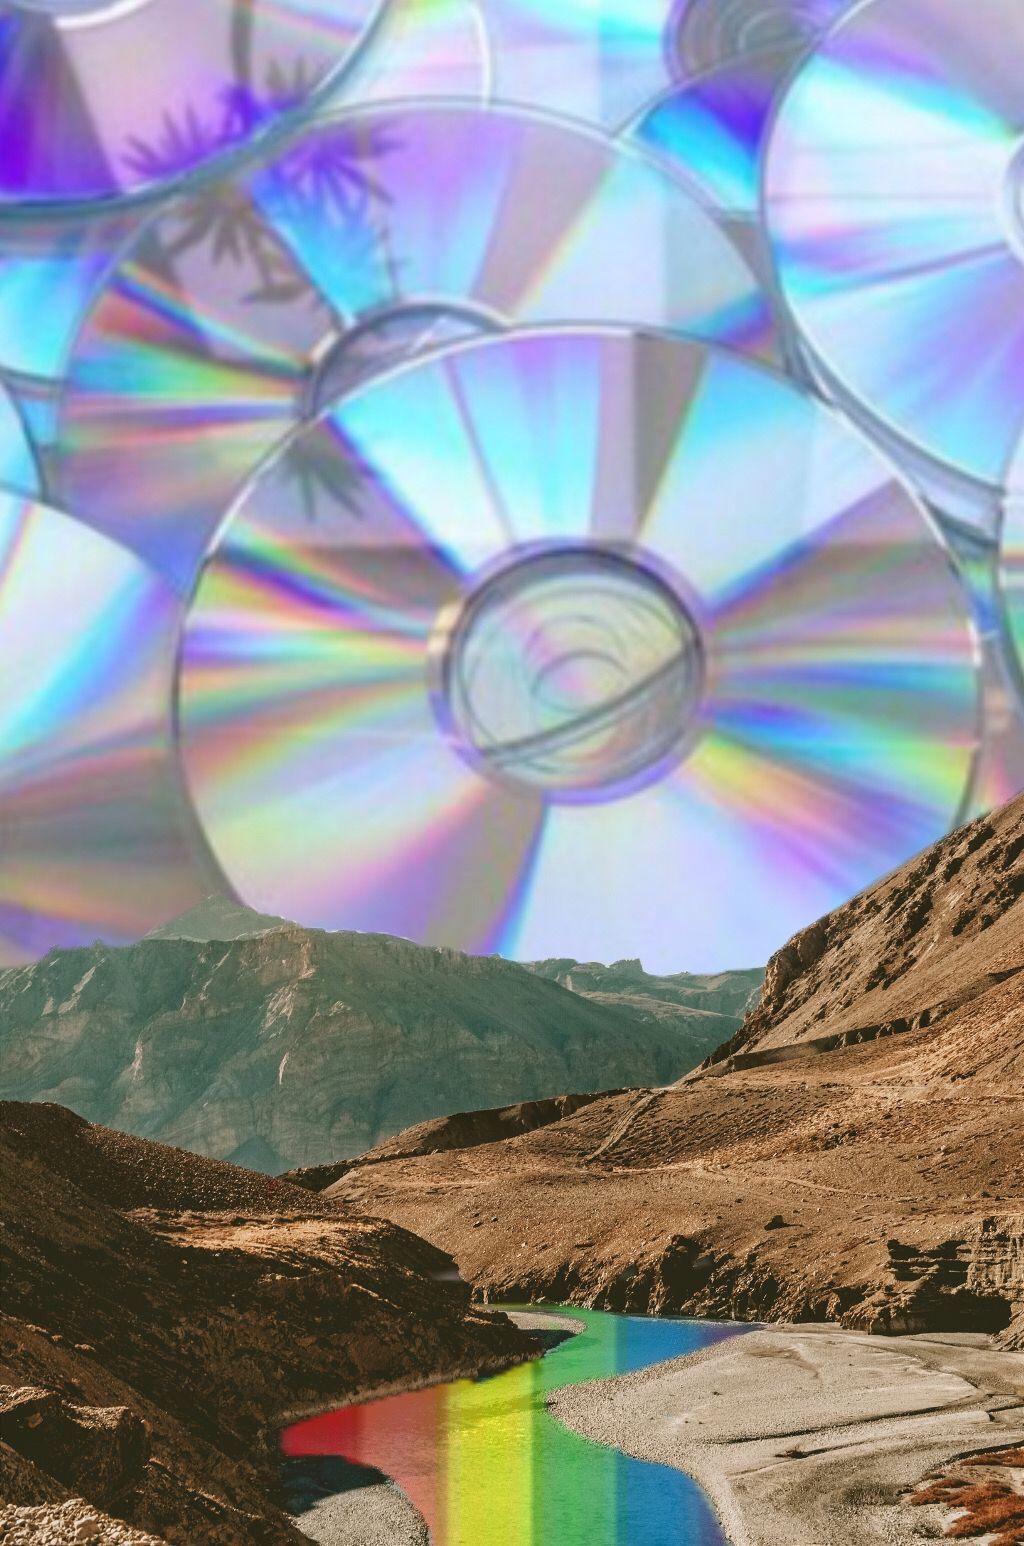 #freetoedit #edit #cd #aesthetic #mountain #rainbow #lake #stream #river #view #sky #hill